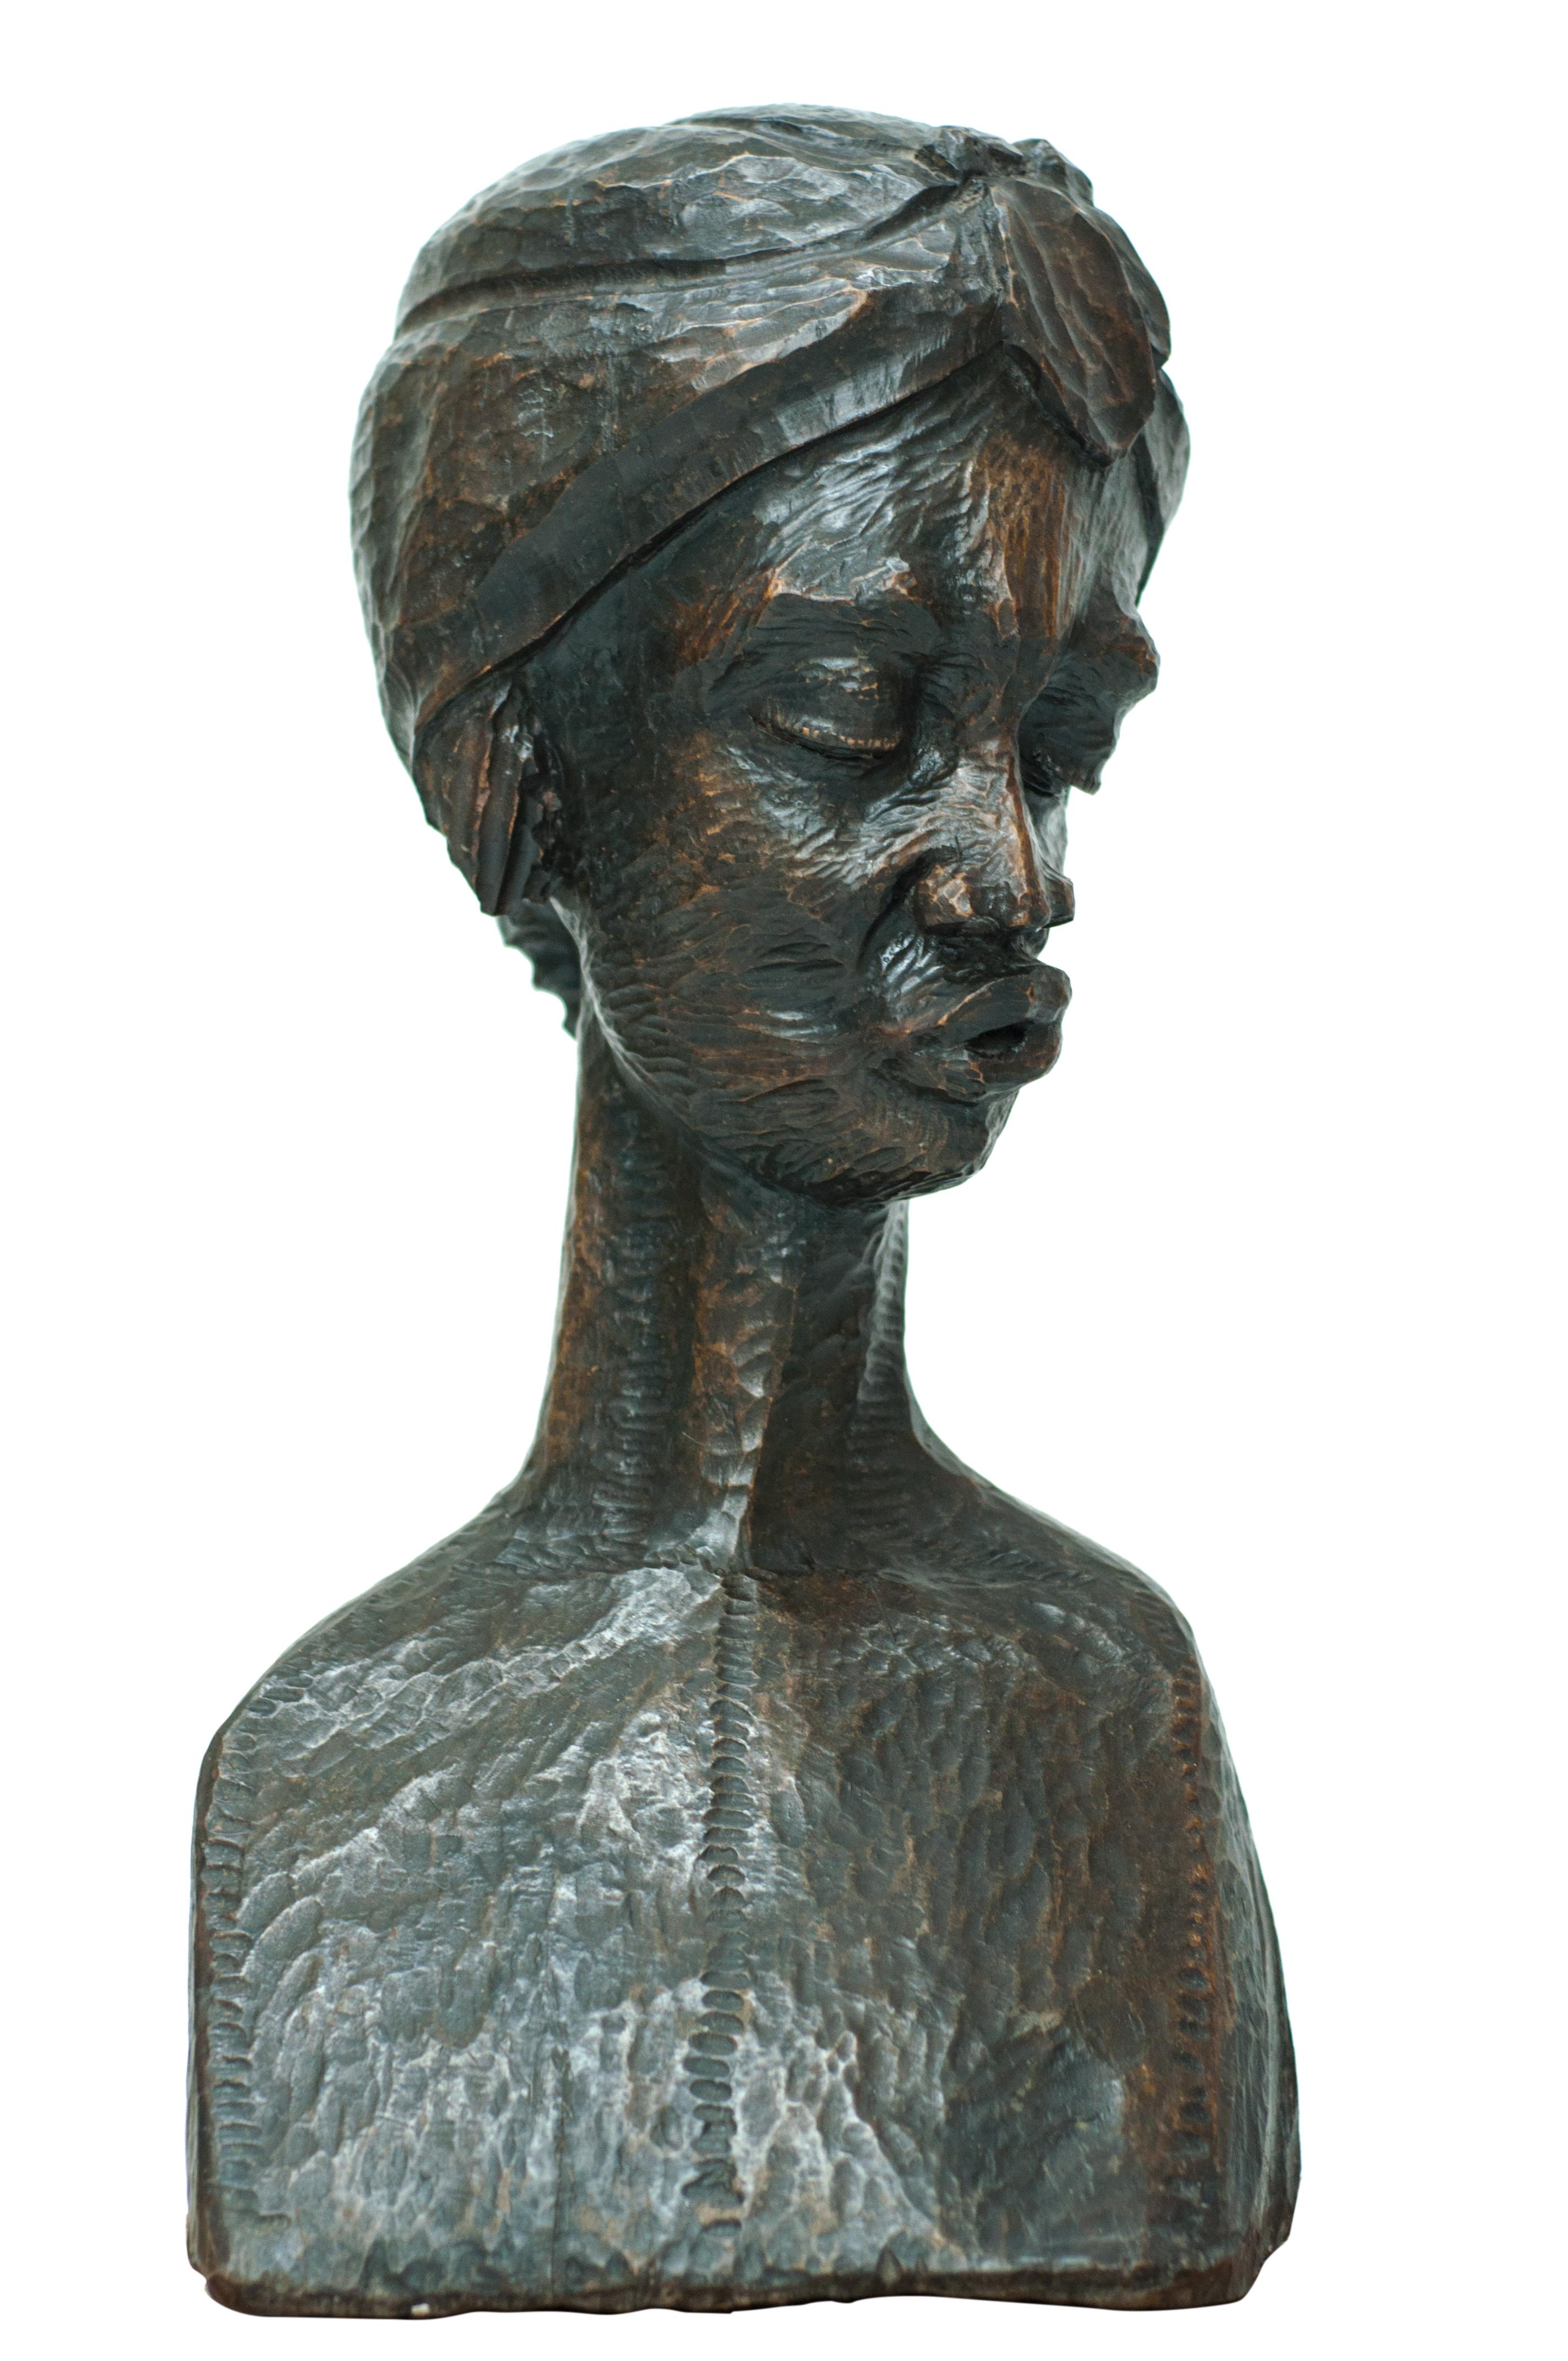 Volcy R. 7X10X20 #1-3-11 Sculpture:Bois.